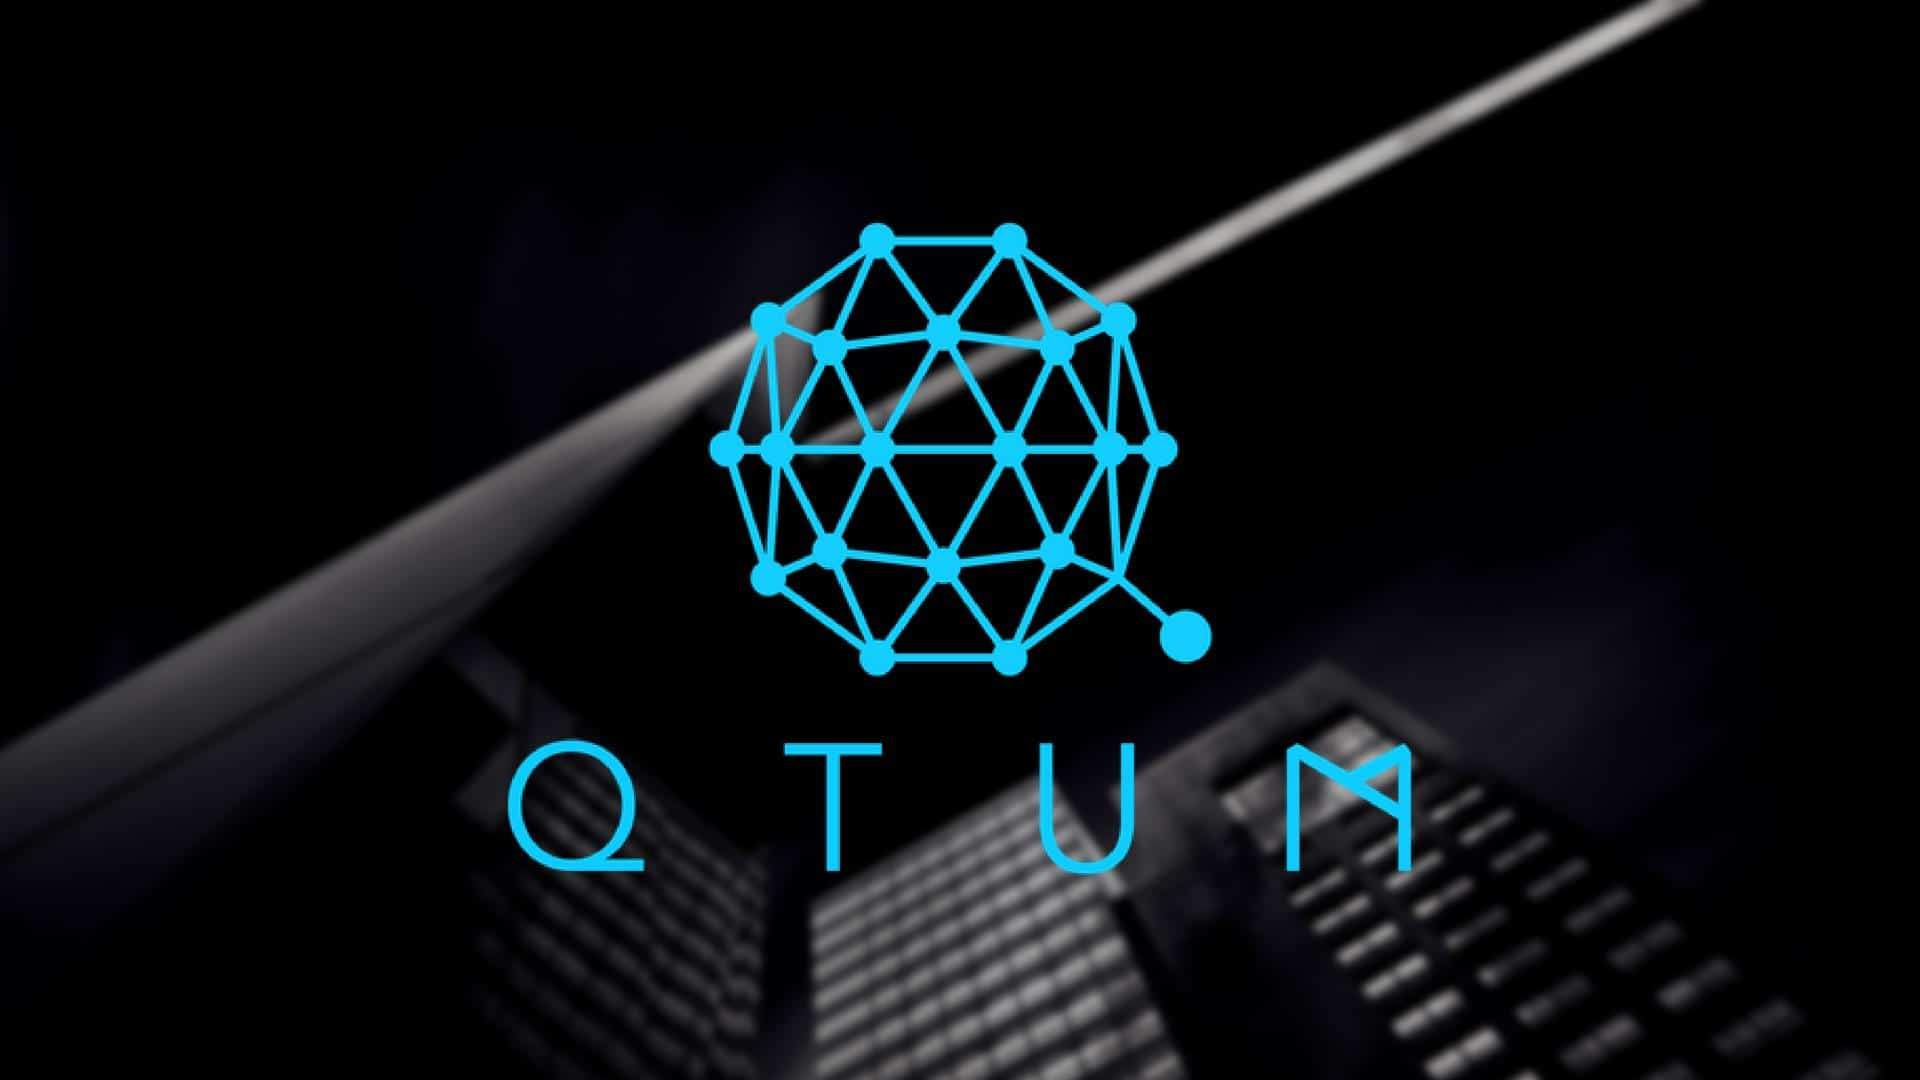 Qtum deploys $1 million for DeFi